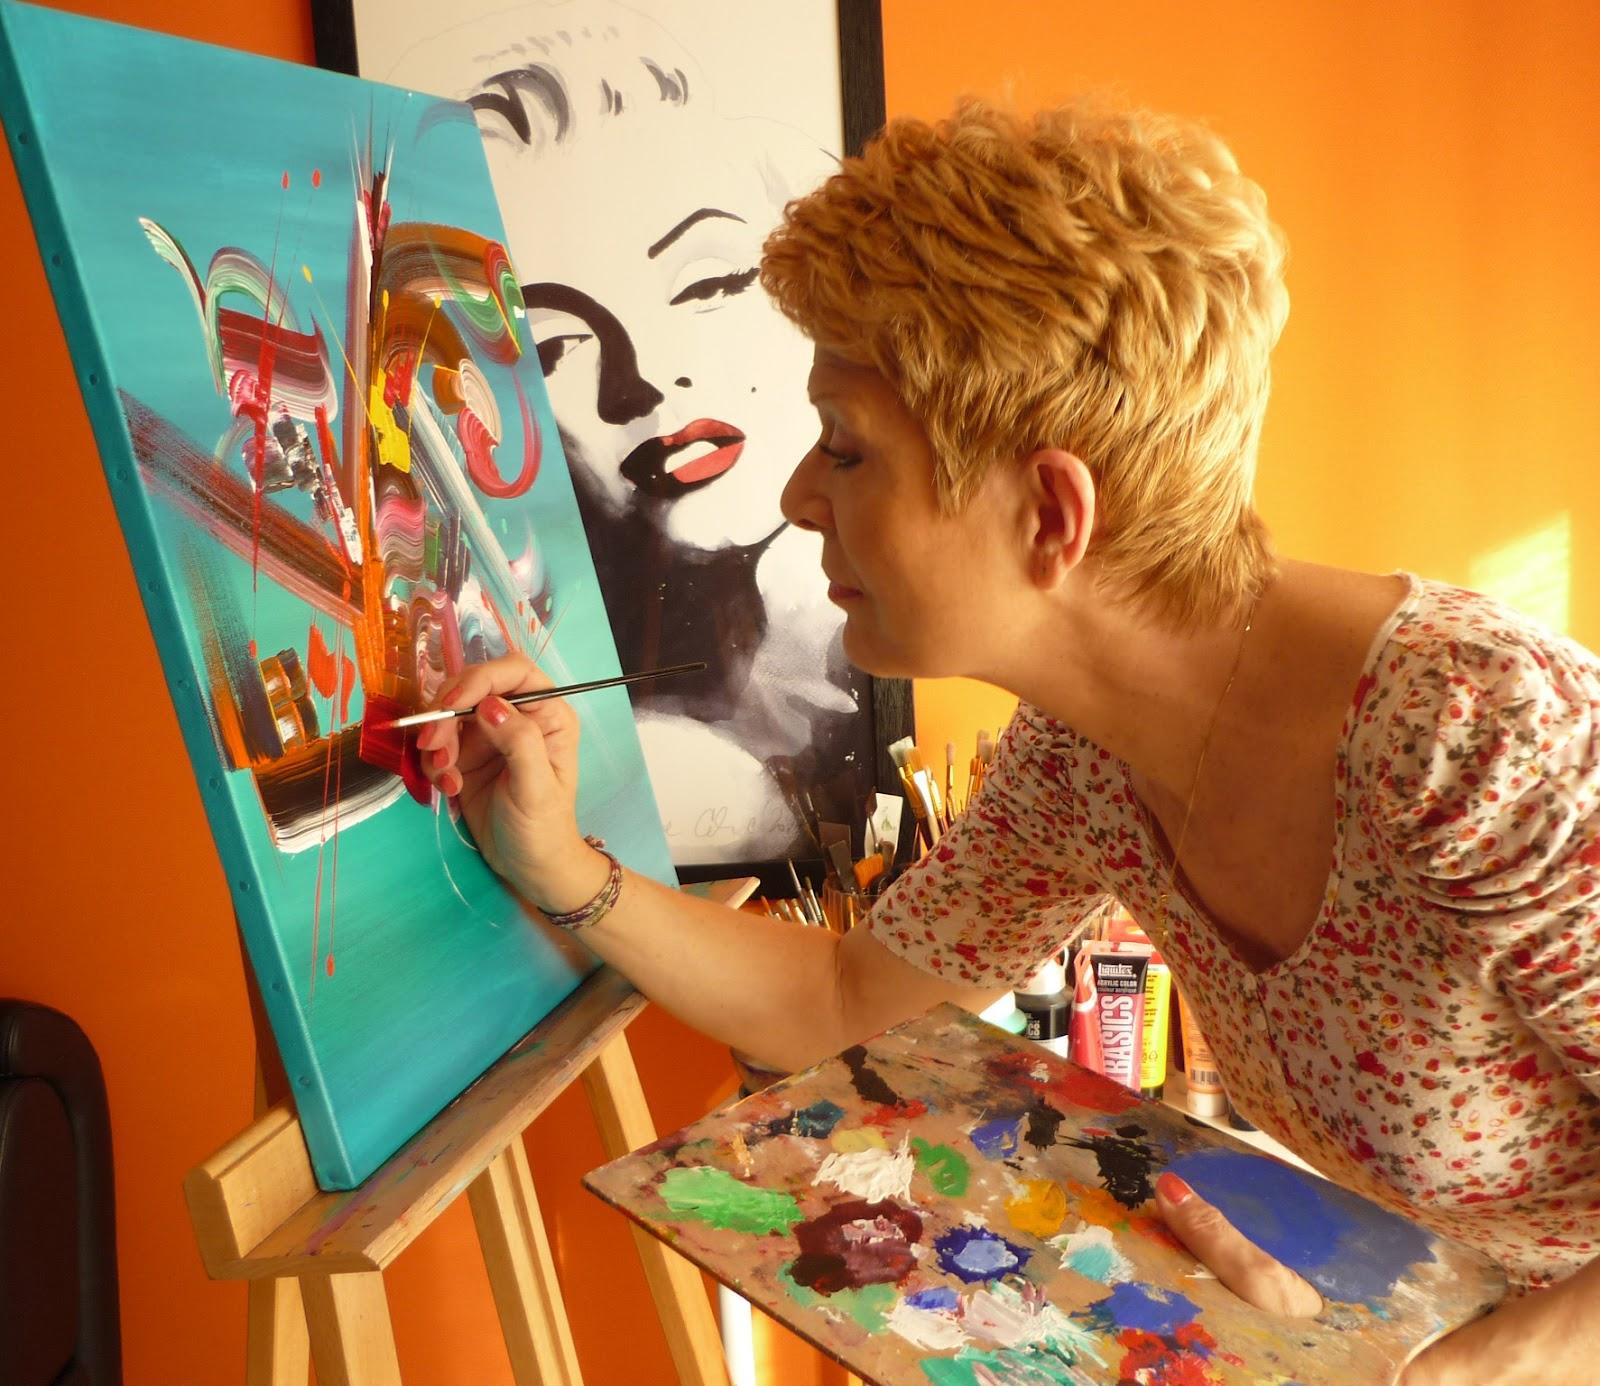 Ma peinture sur toile peinture abstraite martine for Biographie artiste peintre